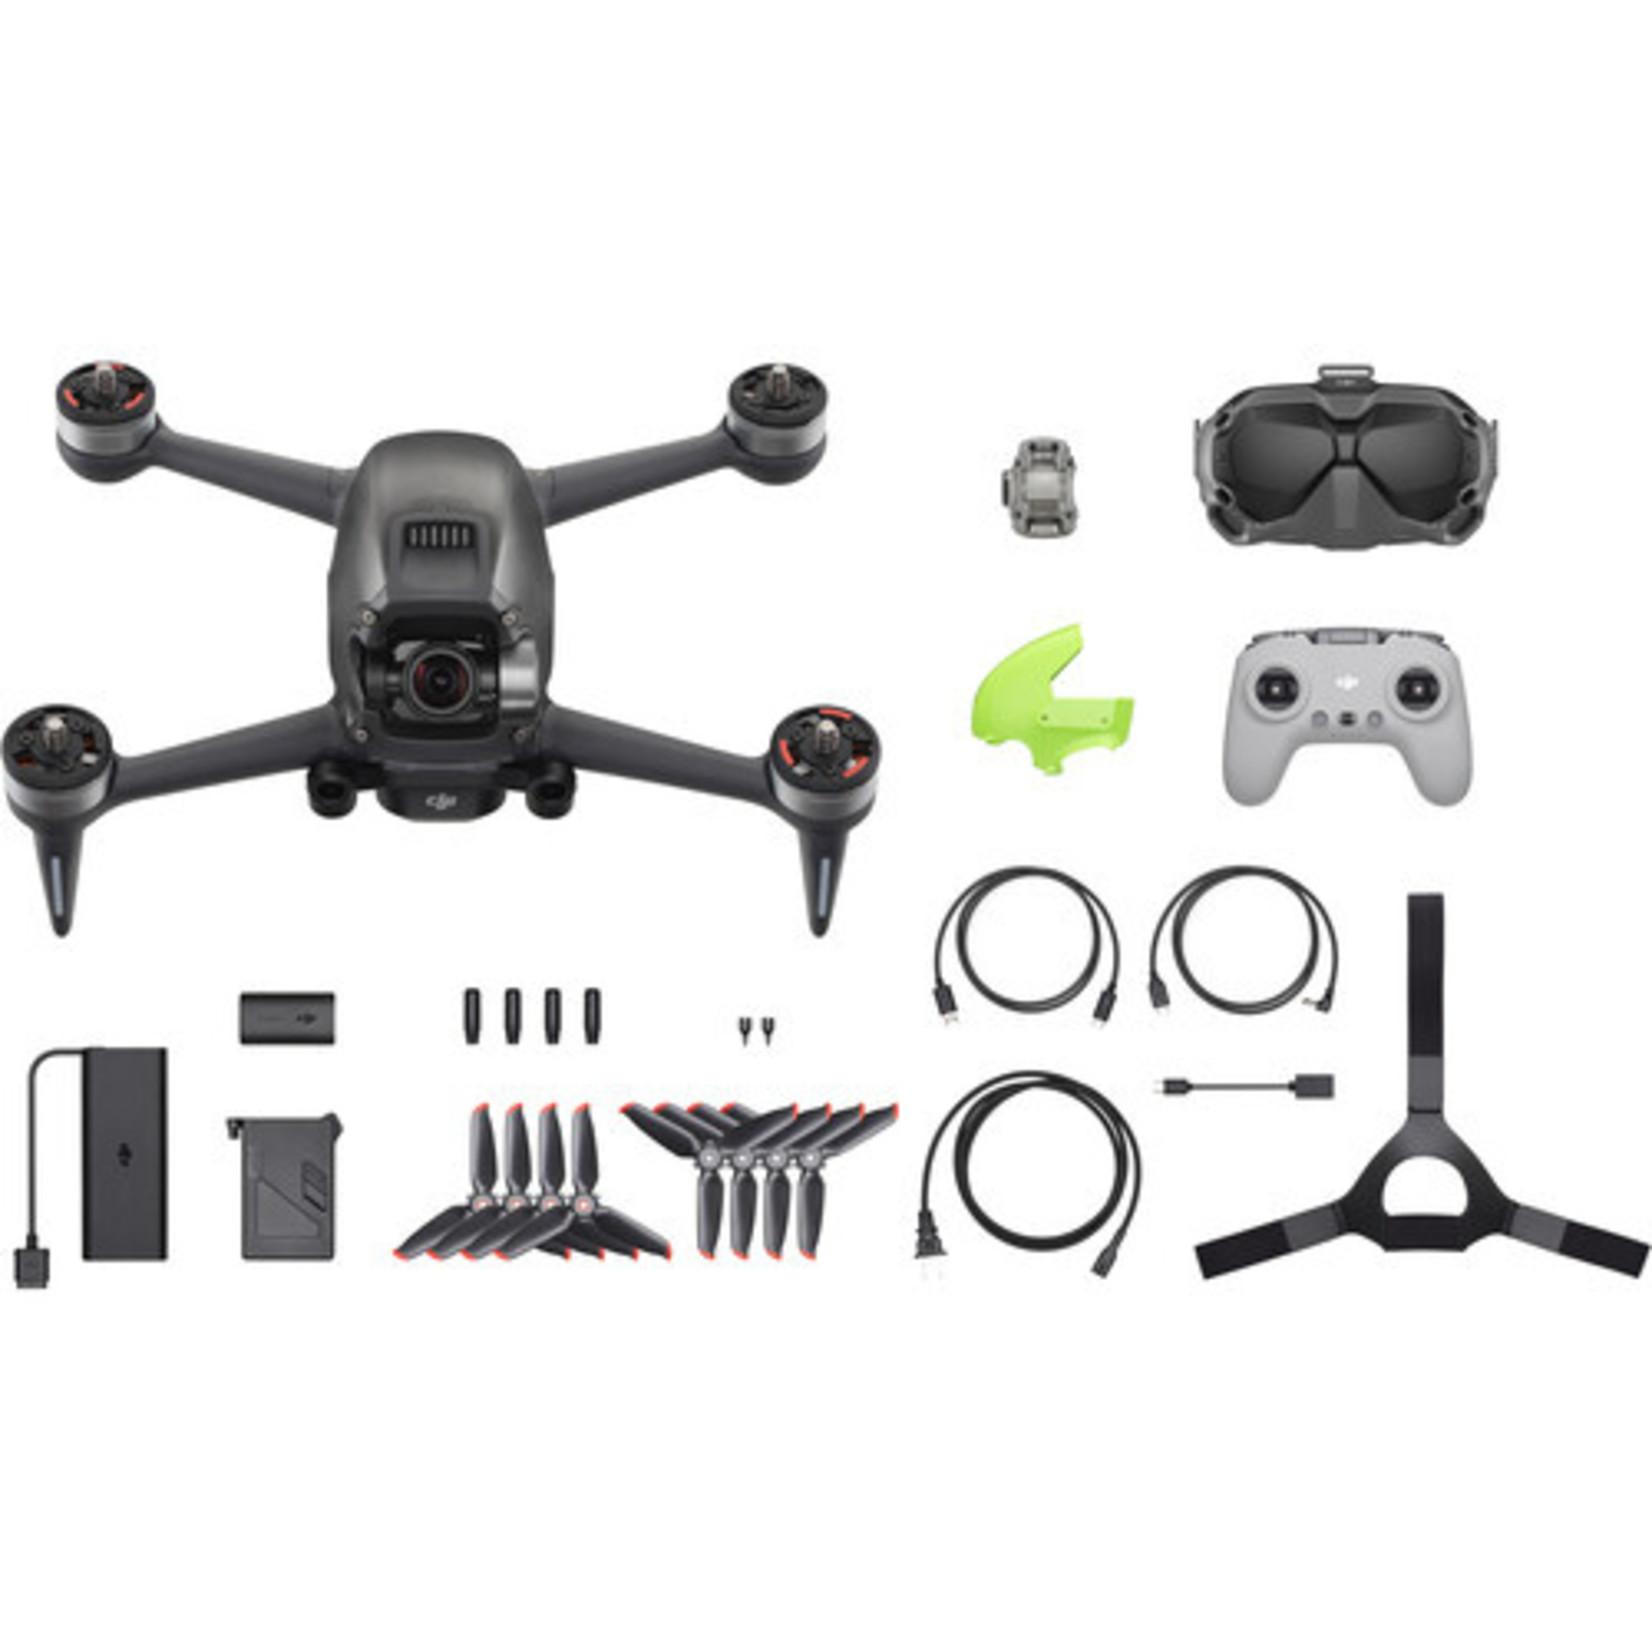 DJI DJI FPV Drone (Combo)